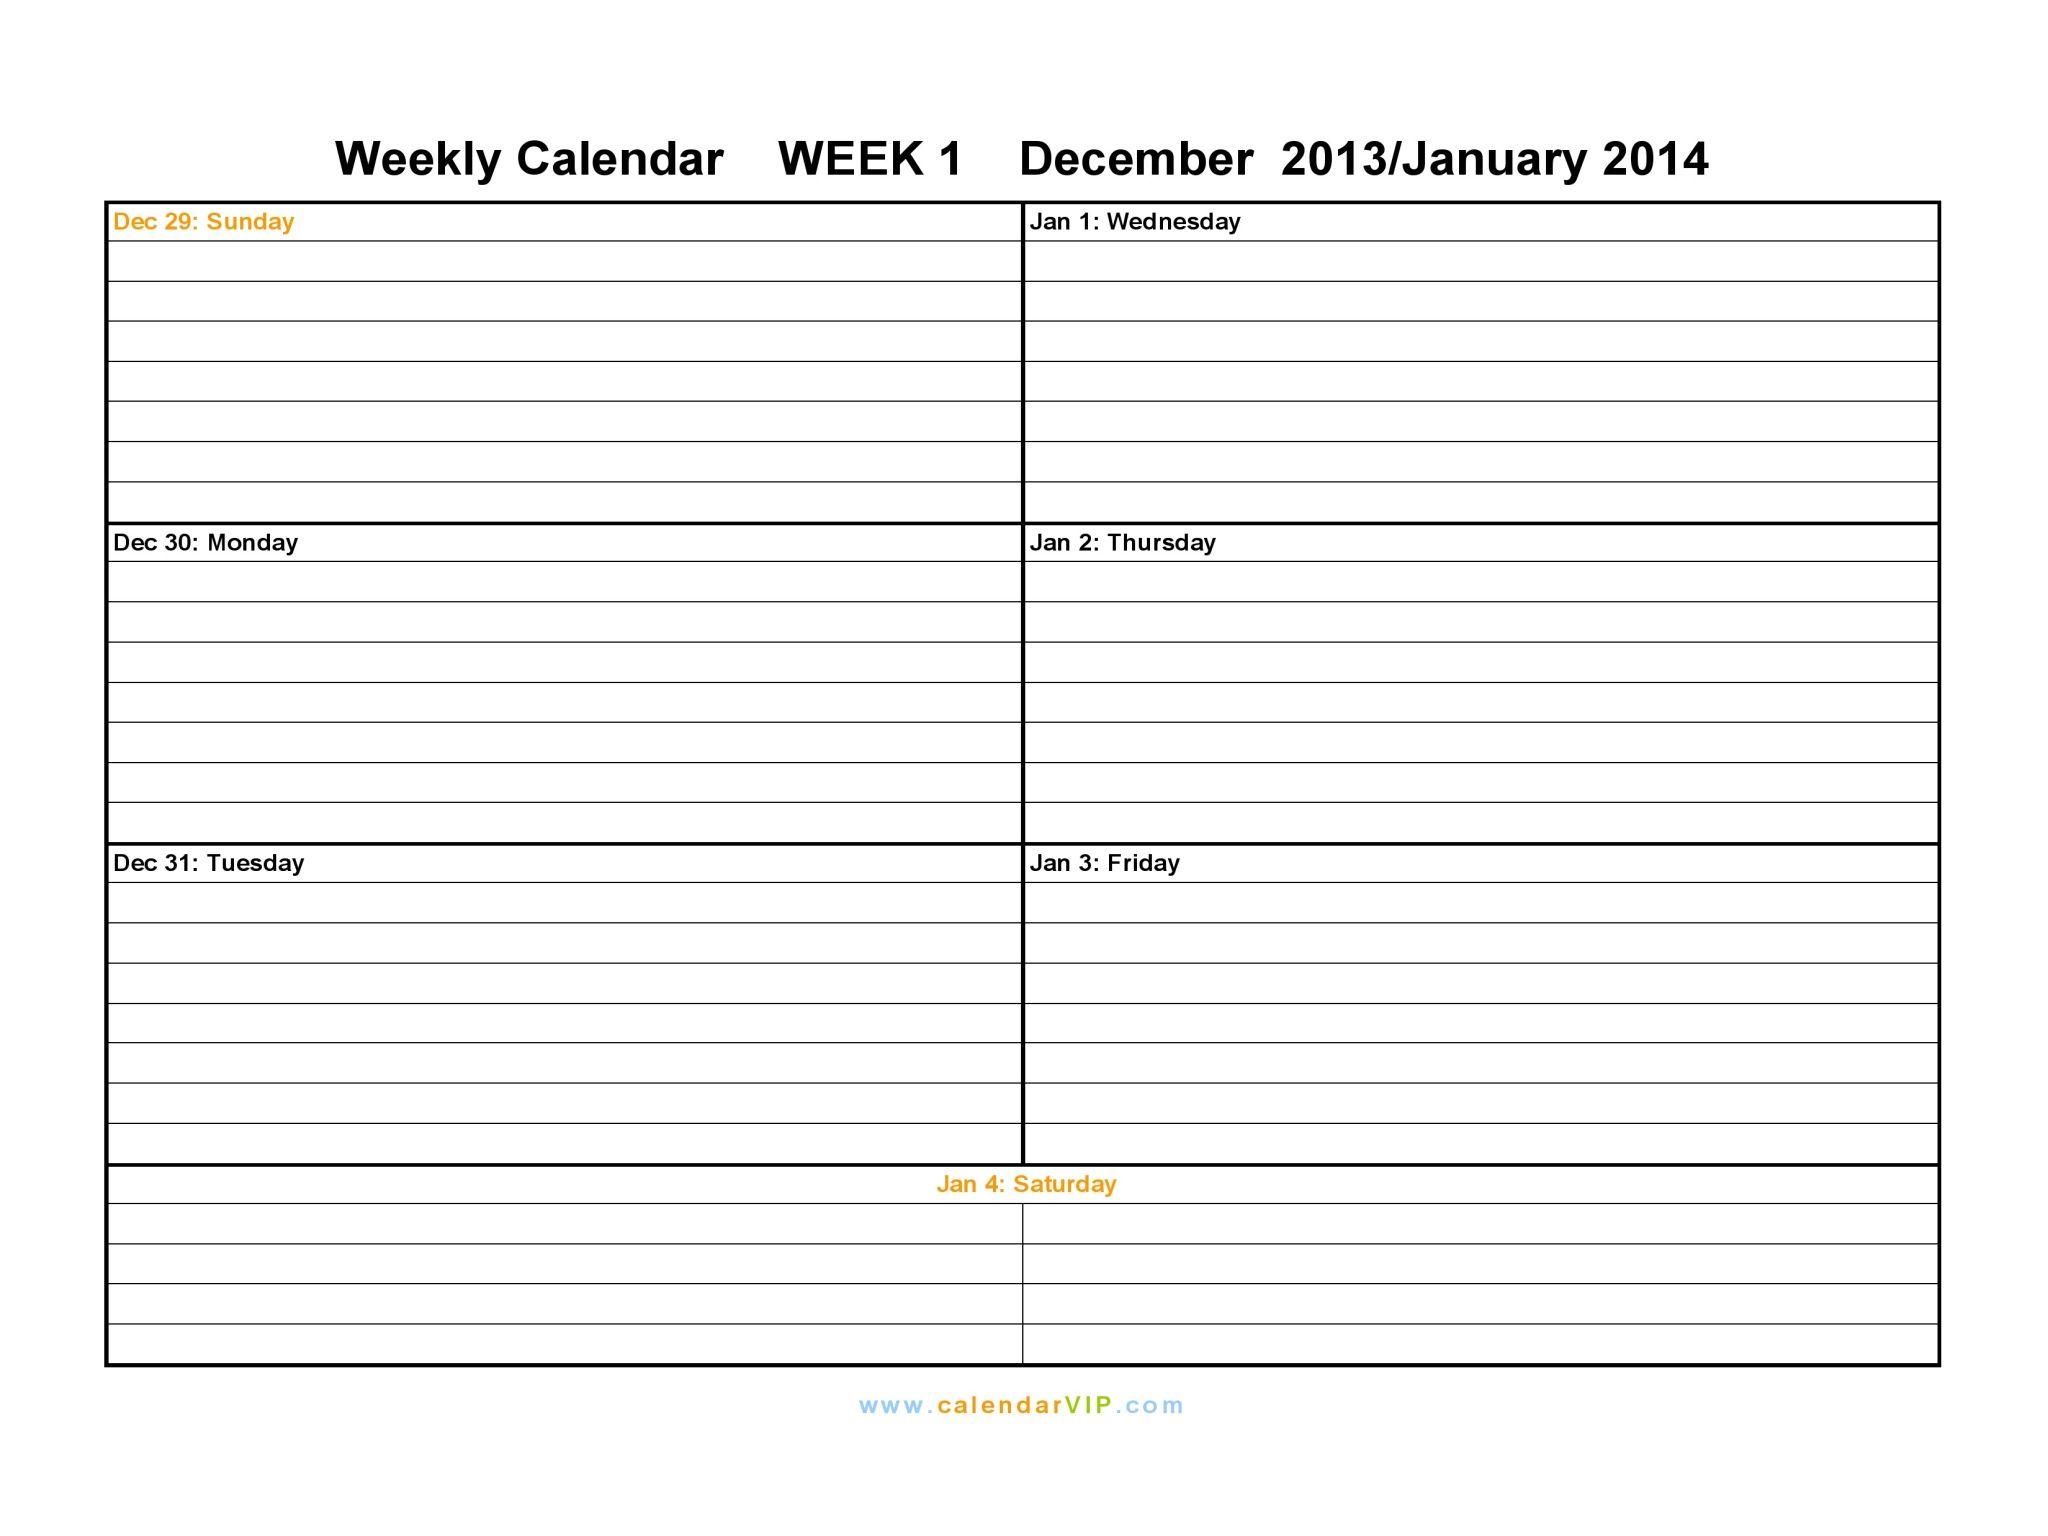 Free Printable Daily Calendars